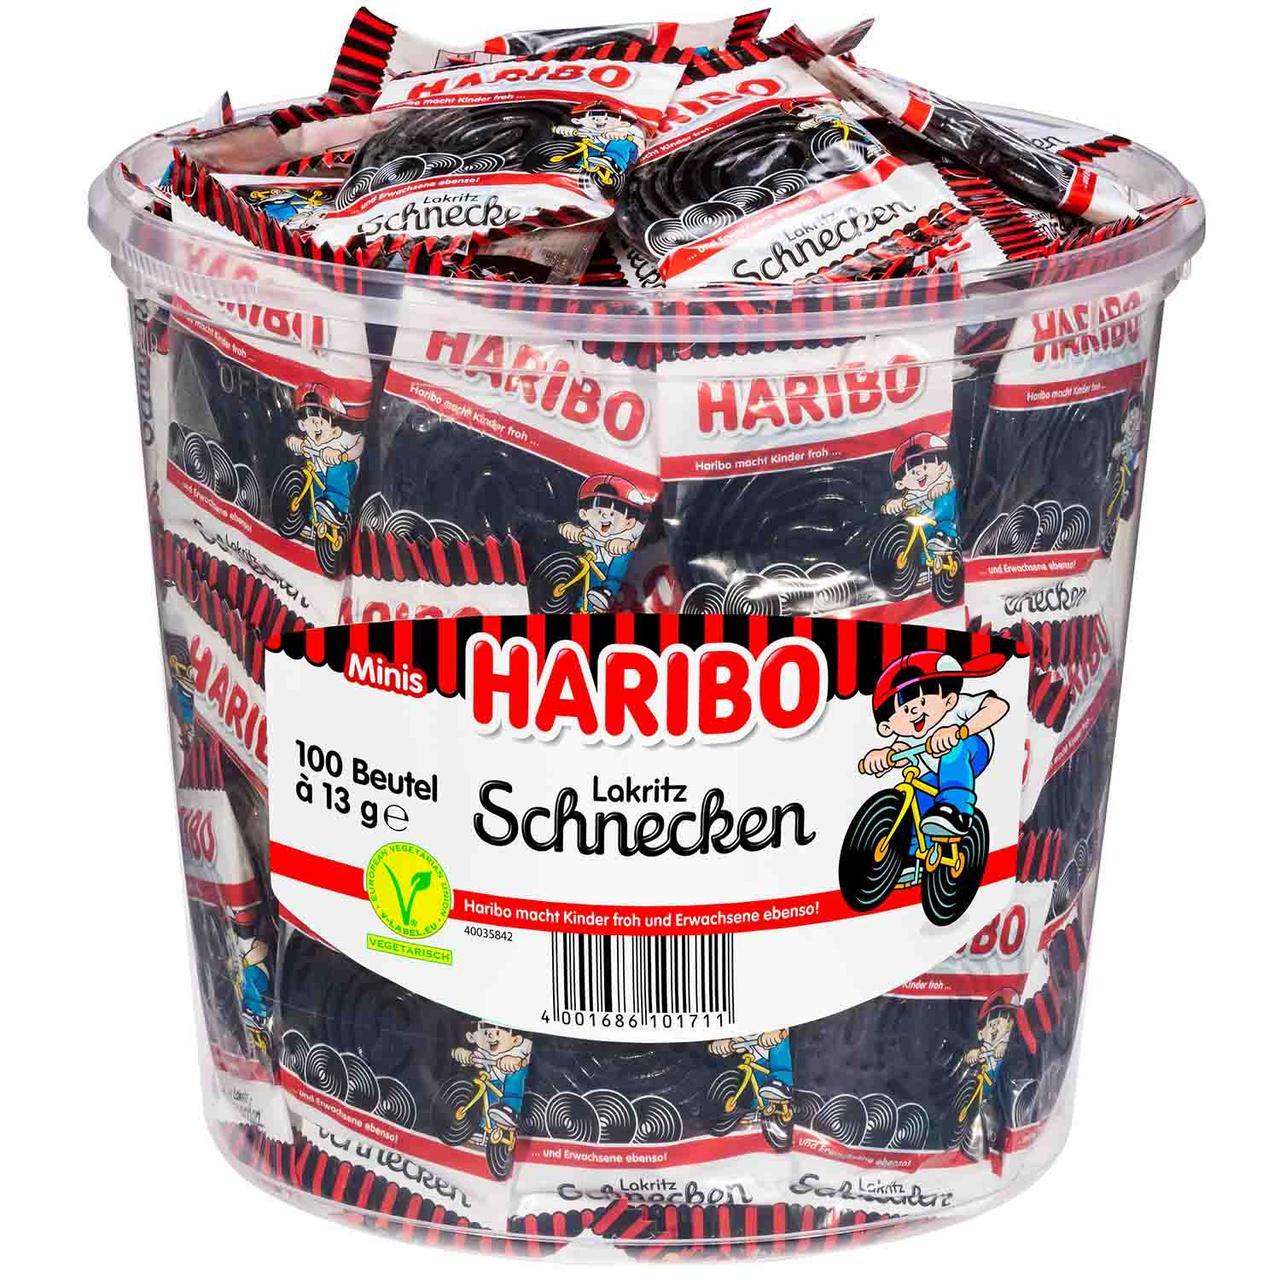 Желейные конфеты Haribo Lakritz Schnecken 100s 1000 g